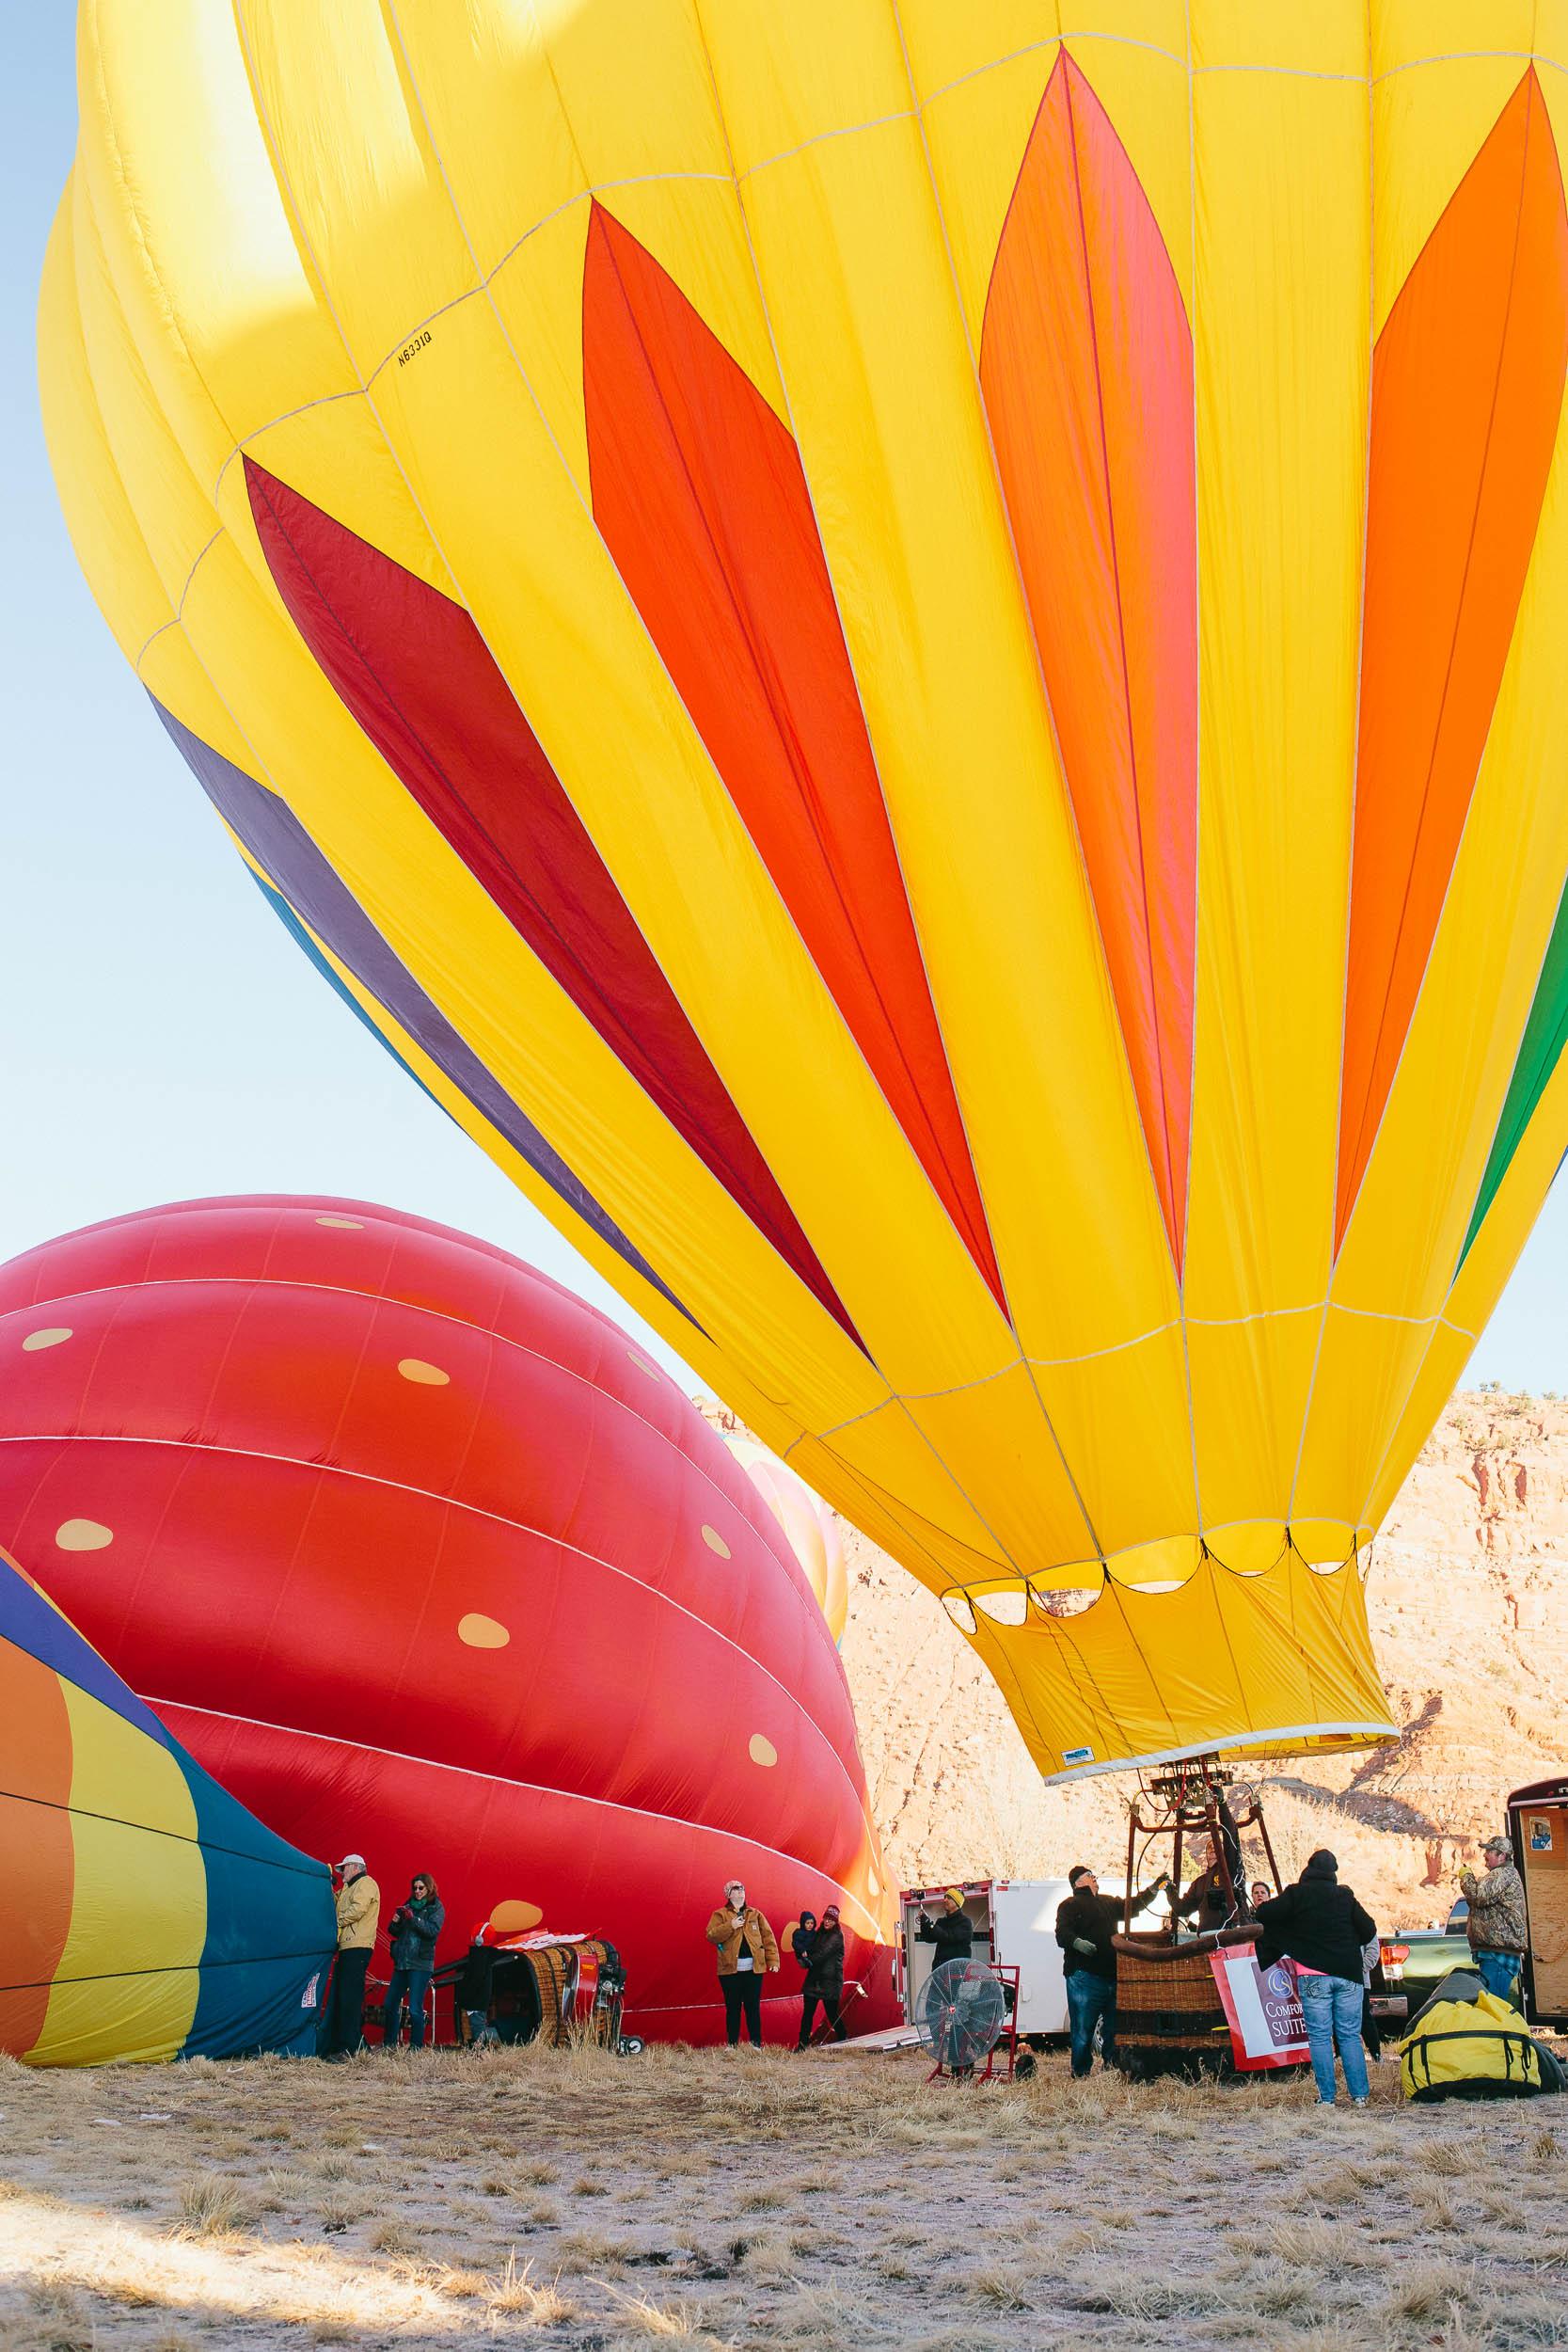 Kyle-Sheppard-Kanab-Balloon-Festival-9.jpg